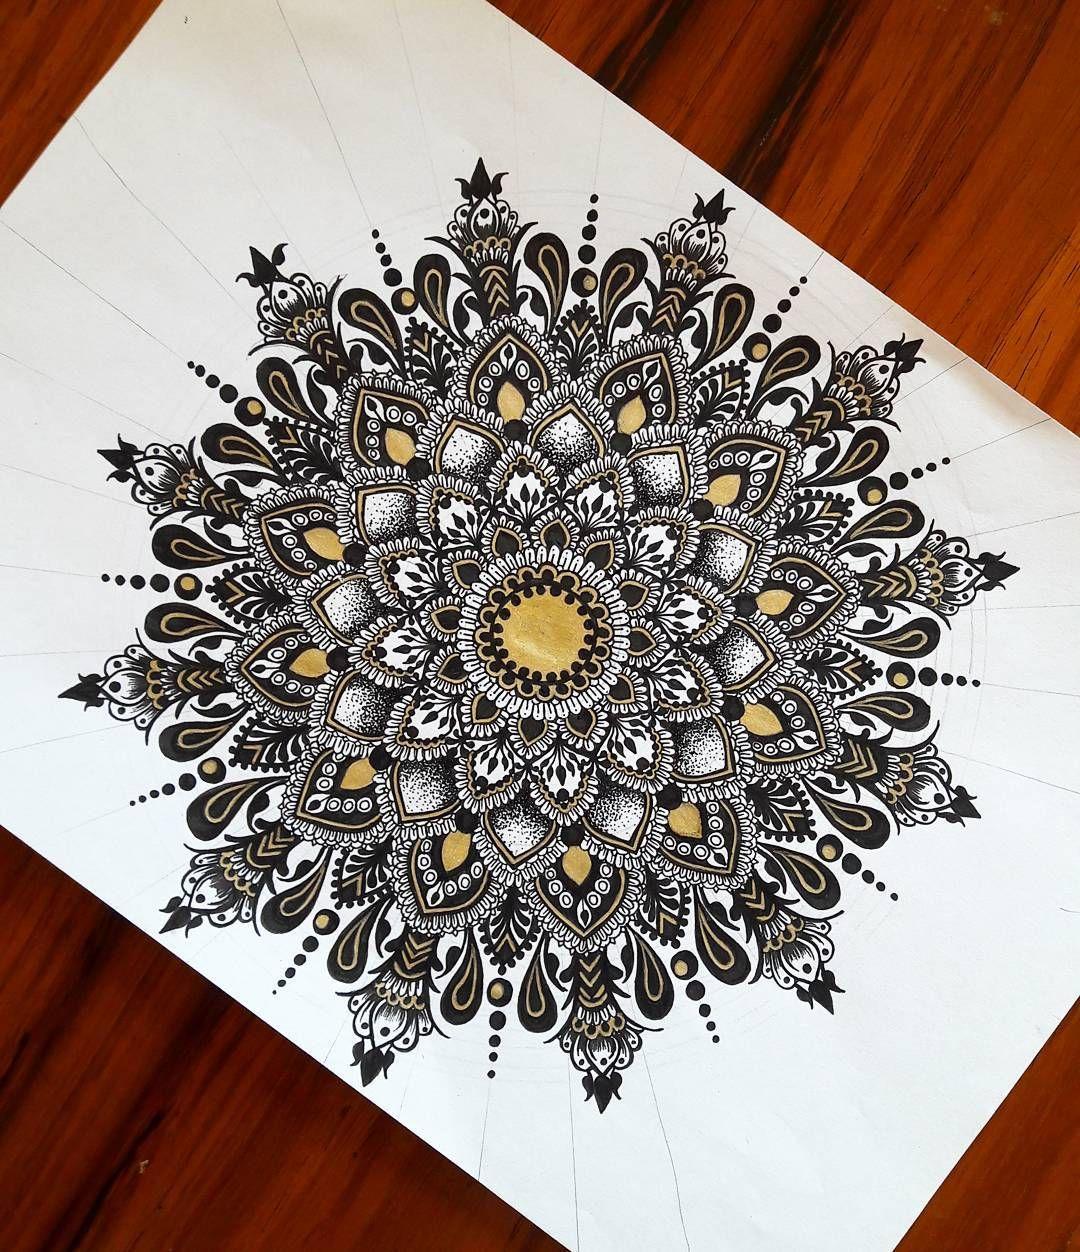 423 Likes 15 Comments Tasneem Abdulla Tasneem Abdulla On Instagram People Keep Saying My Mandalas Mandala Design Art Mandala Art Lesson Mandala Drawing